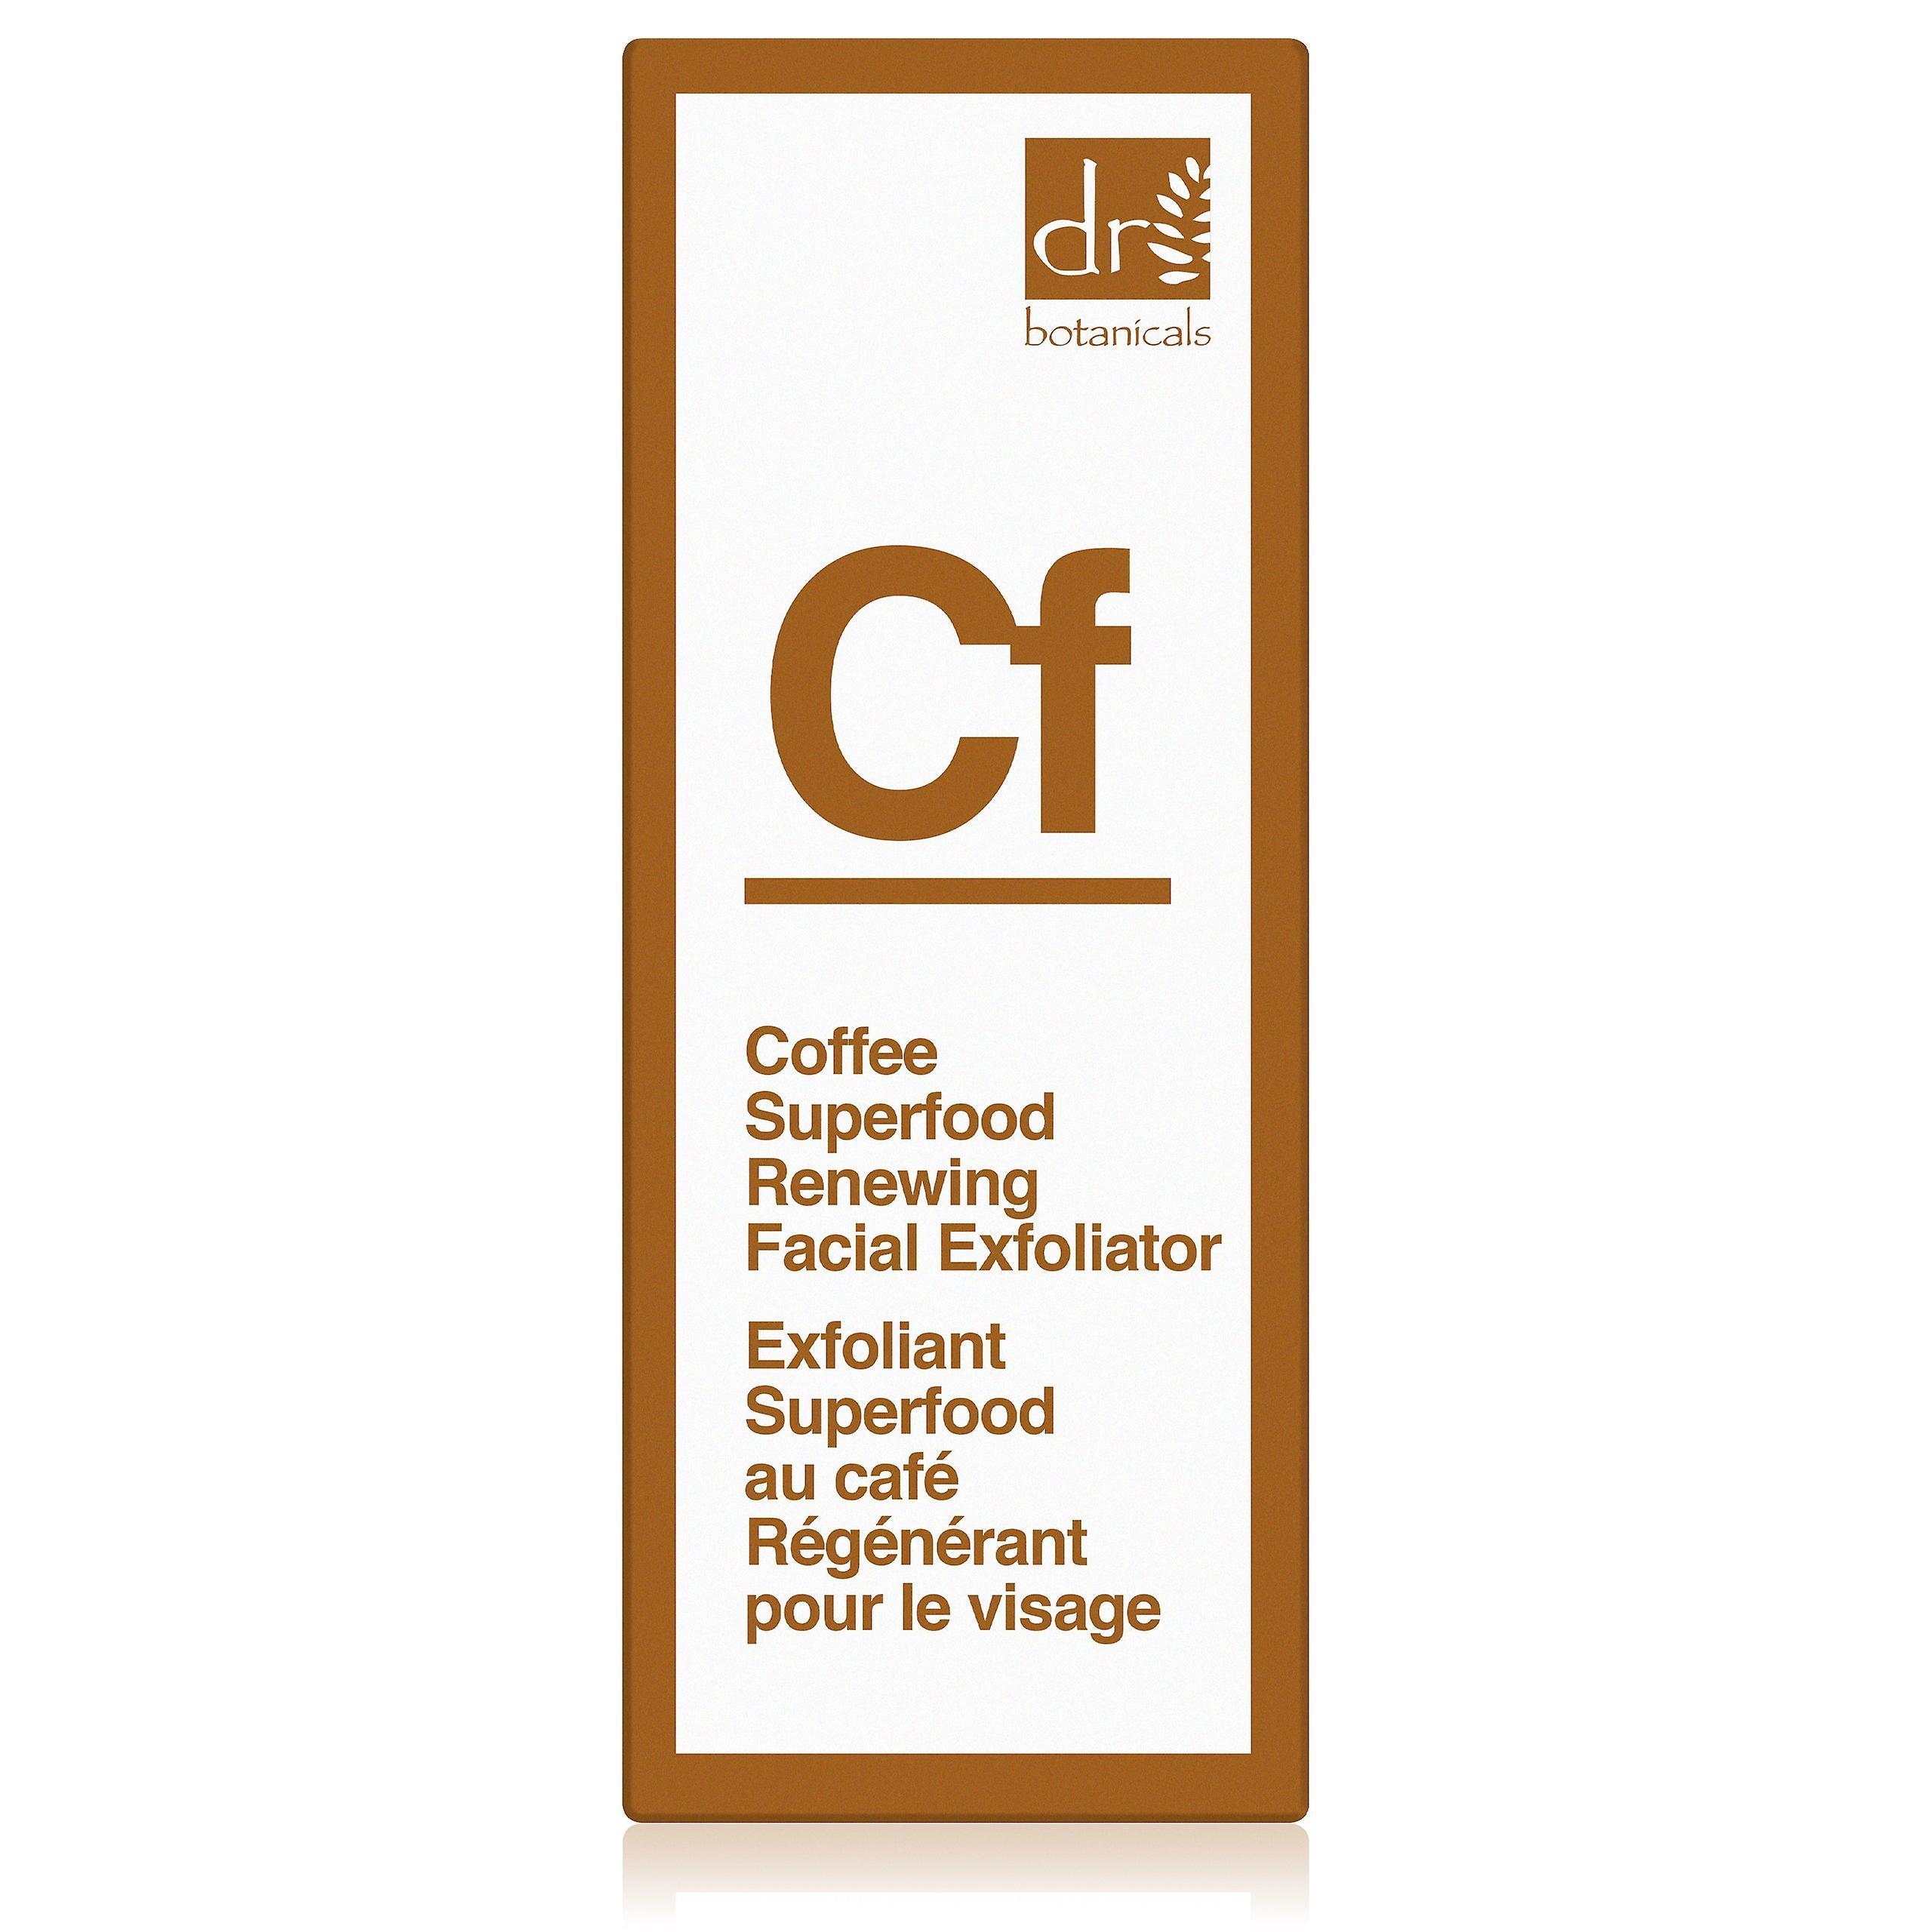 Coffee superfood renewing facial exfoliator (30ml)